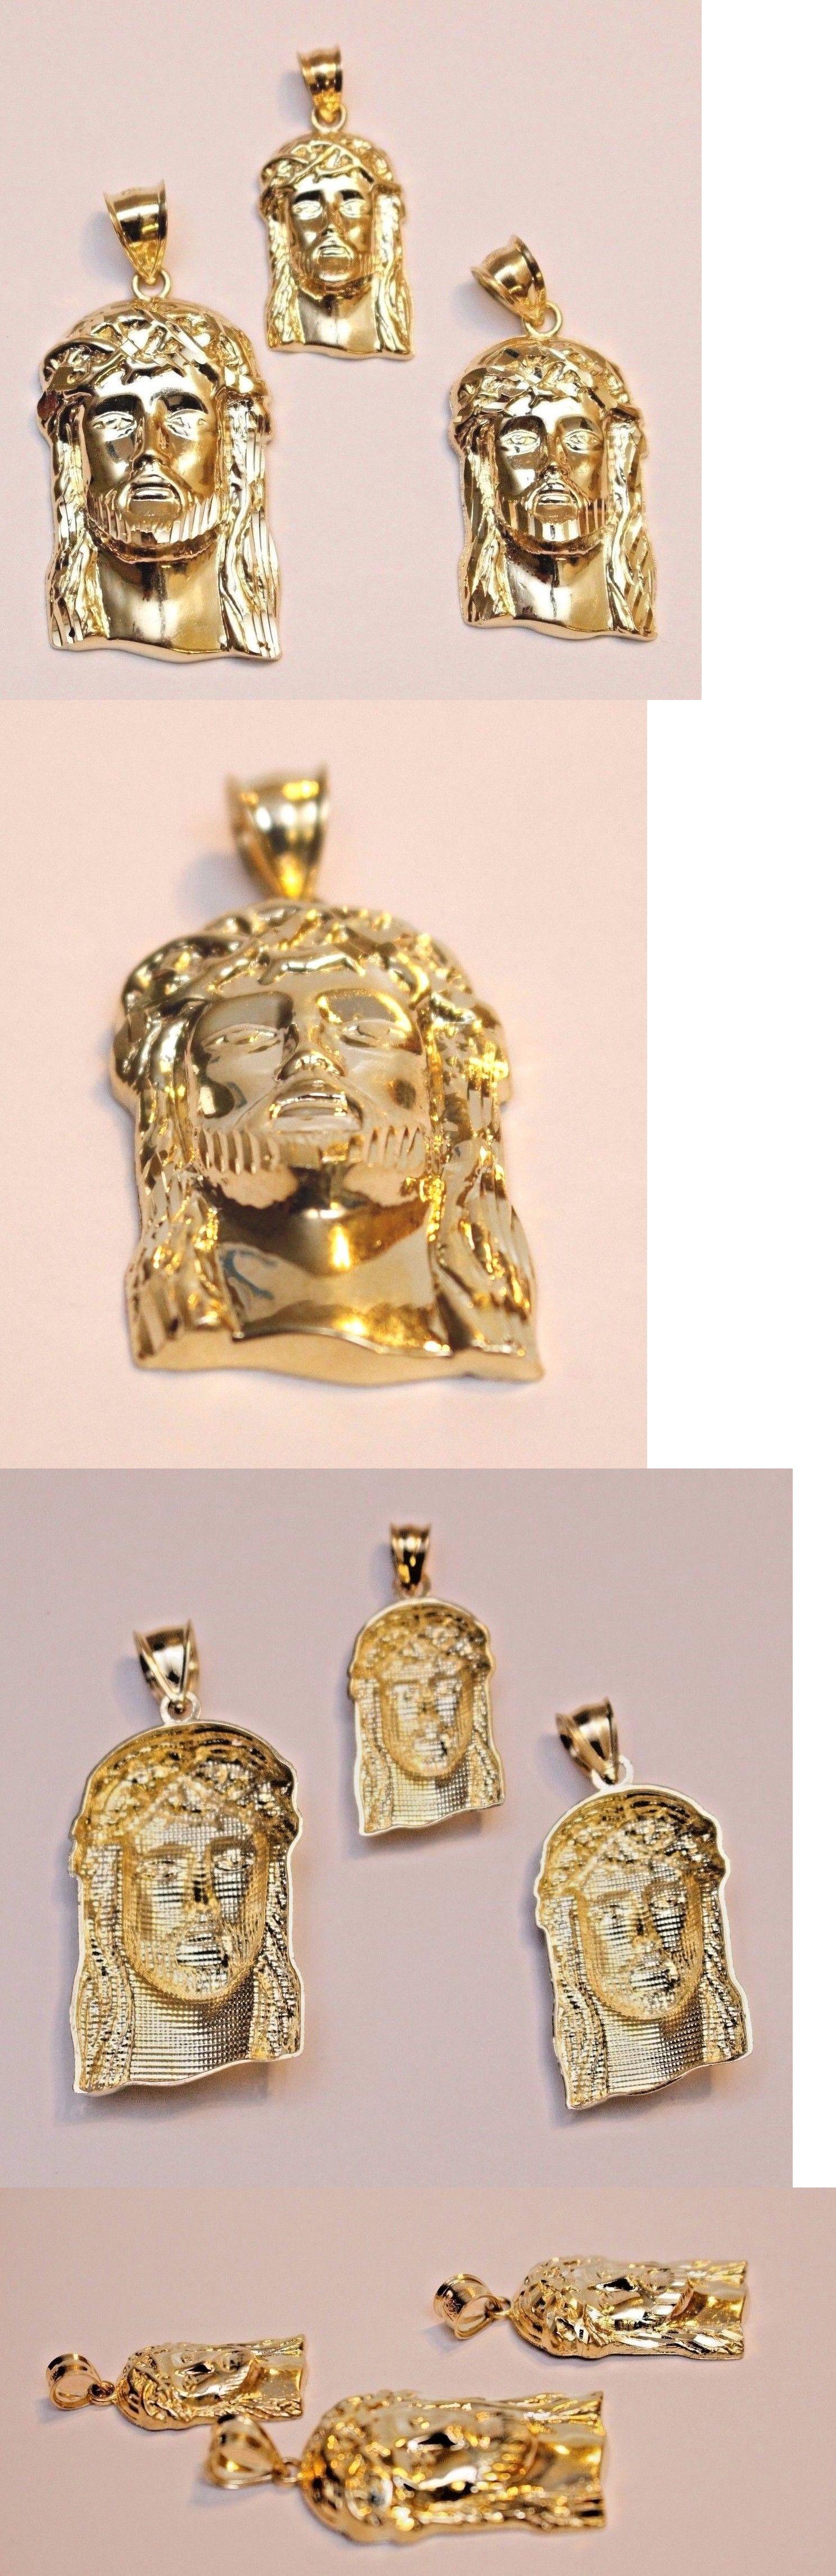 K gold diamond cut jesus face head pendant charm other fine